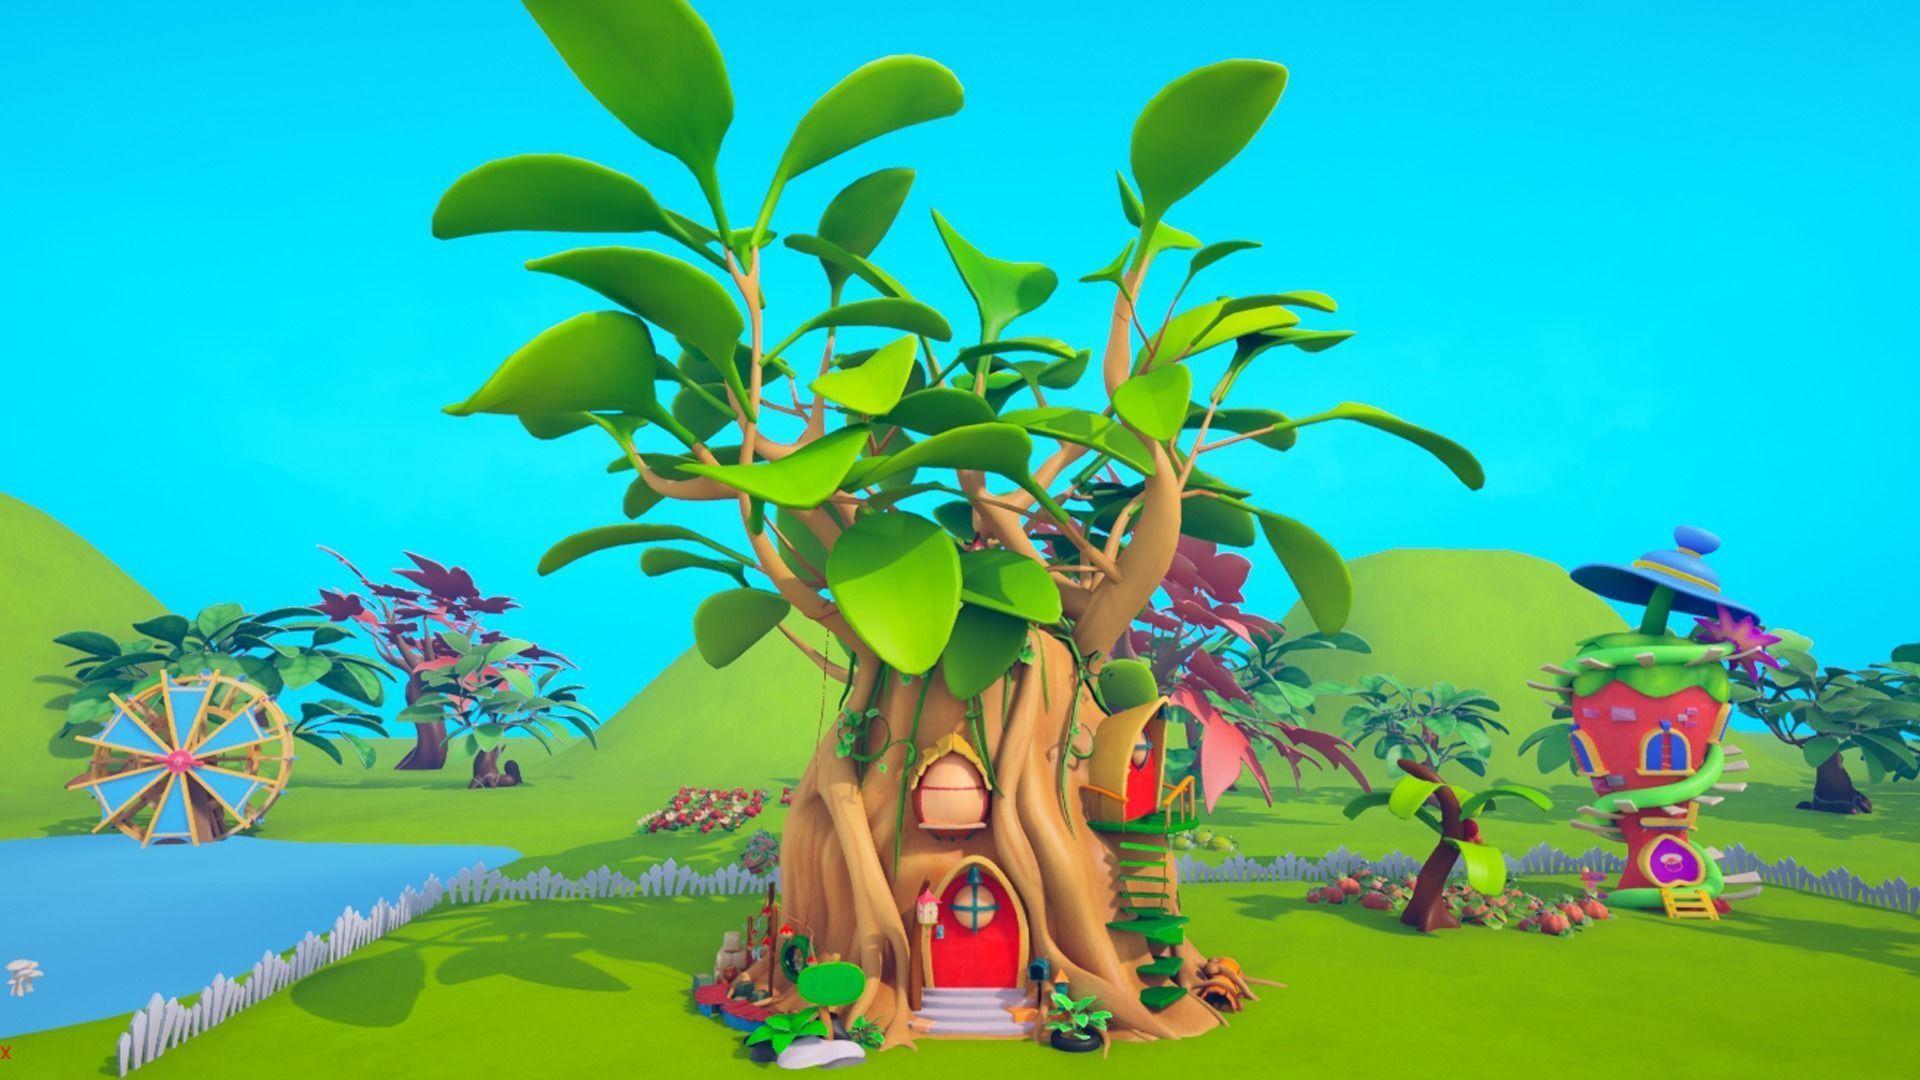 Asset - Cartoons - Background- Farm - Hight Poly